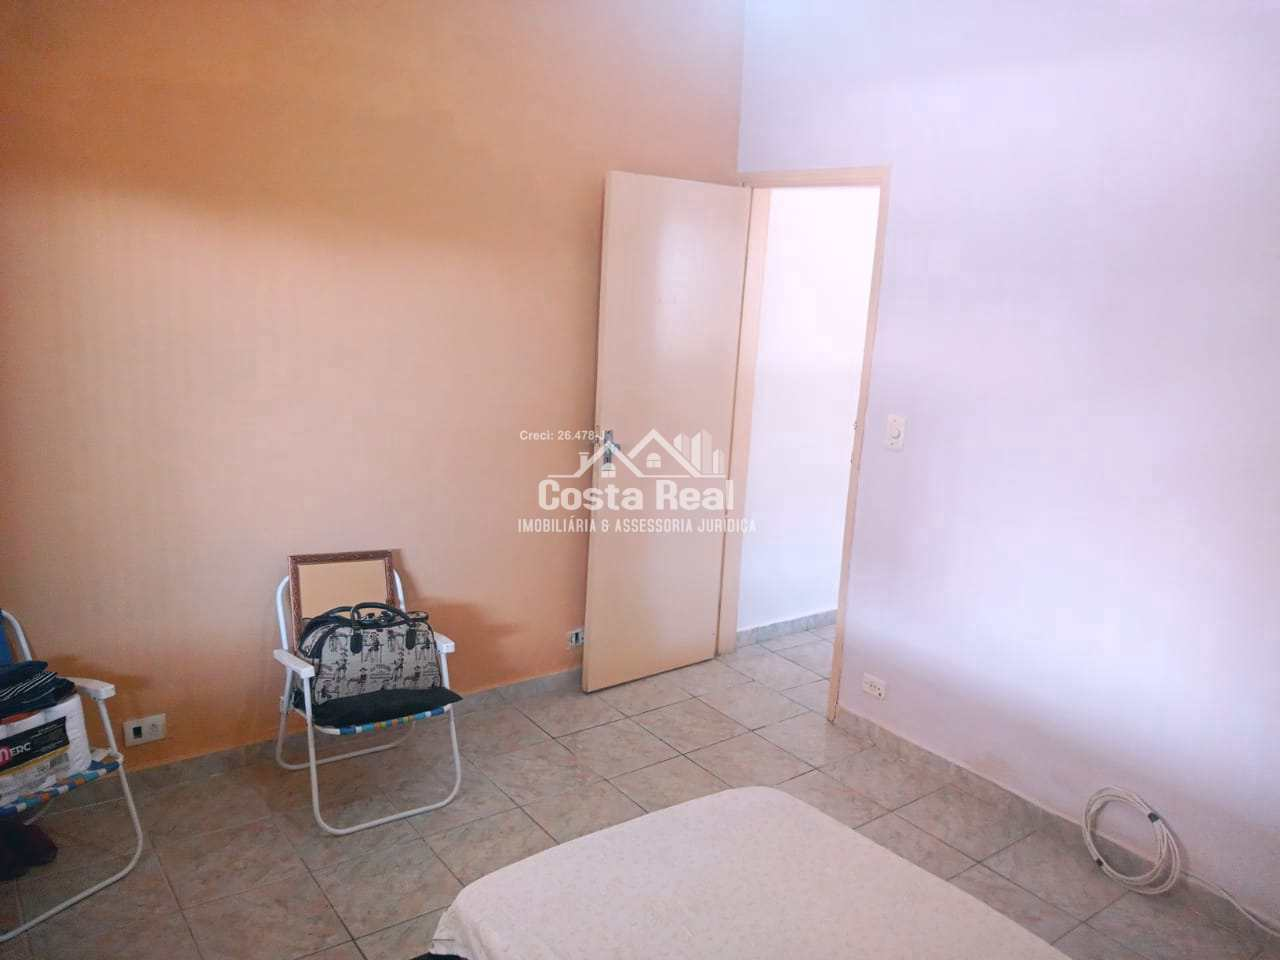 Casa com 2 dorms, Mirim, Praia Grande - R$ 250 mil, Cod: 1197